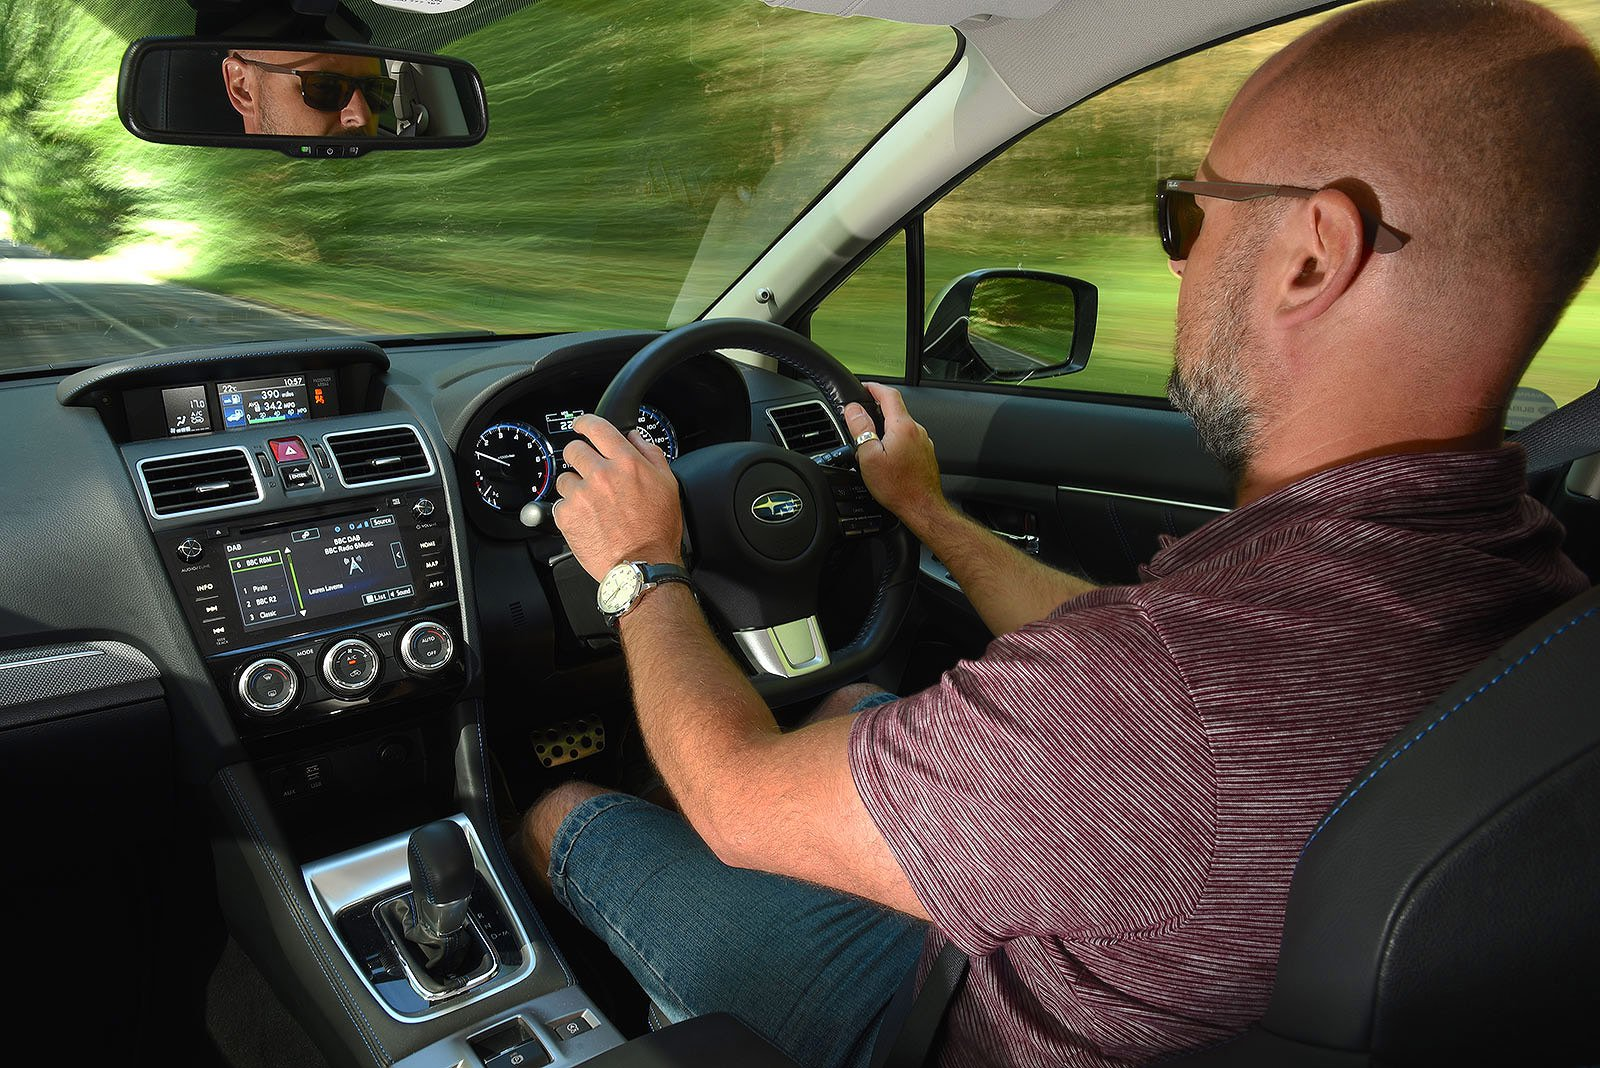 Over-the-shoulder shot of man driving a car